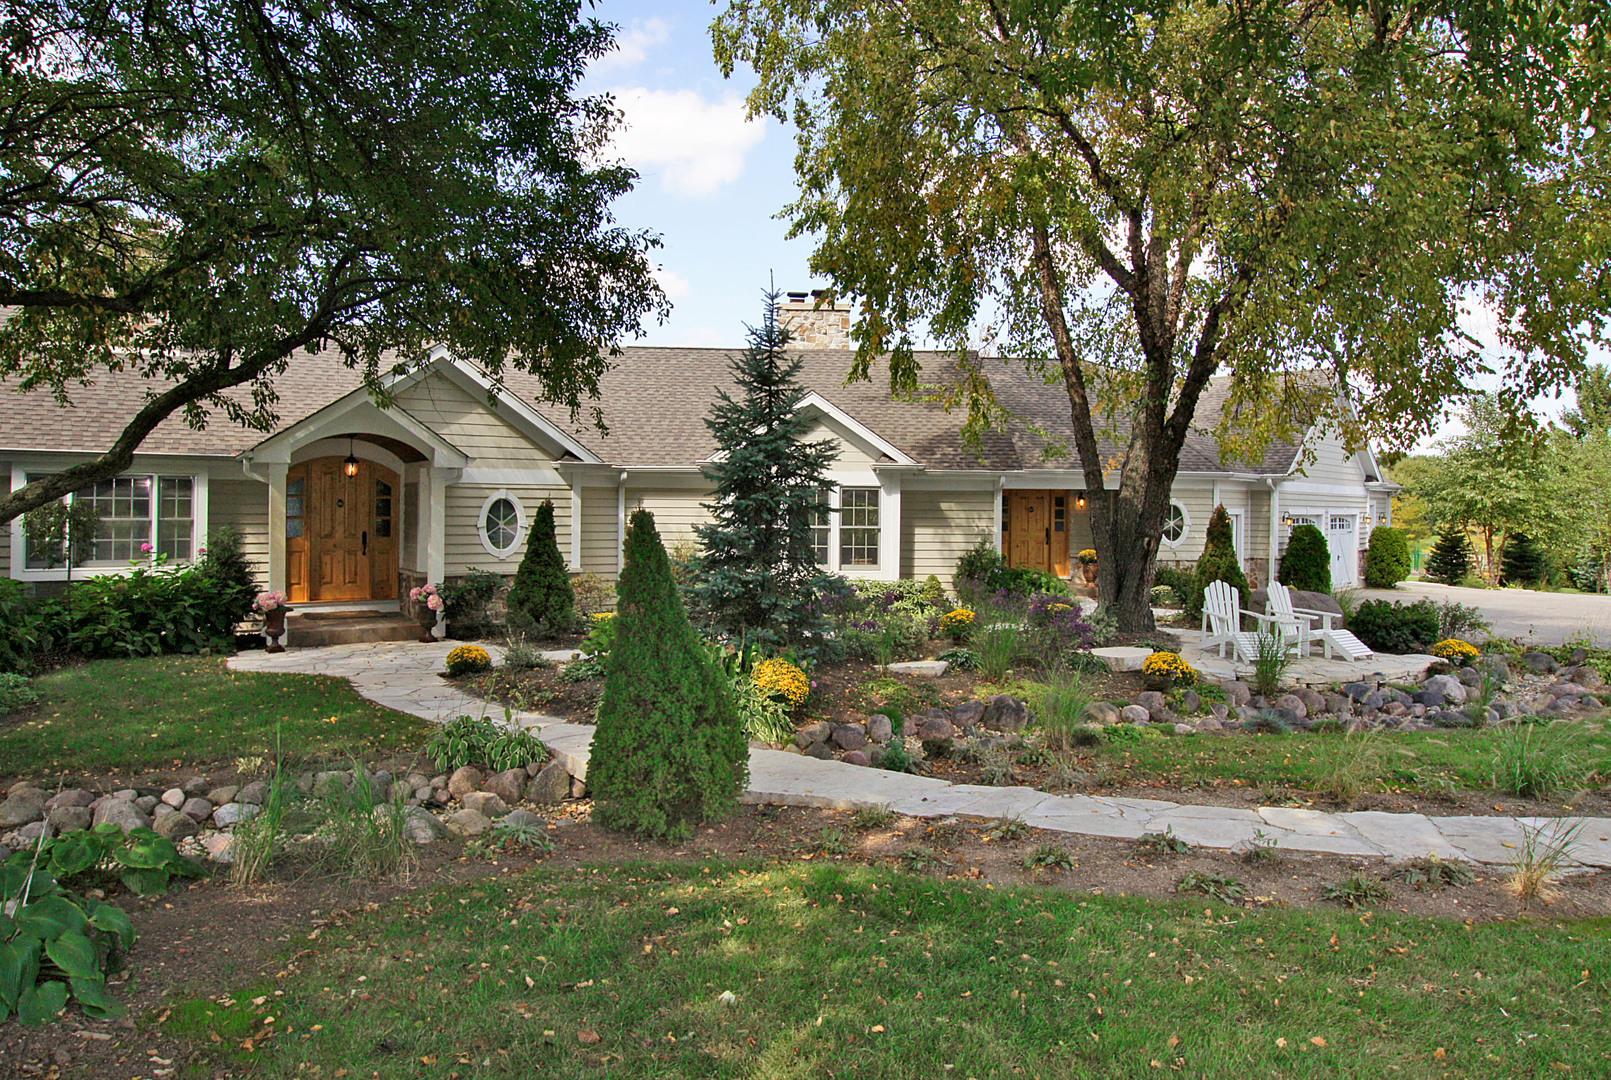 164 North Highland, Inverness, Illinois, 60067